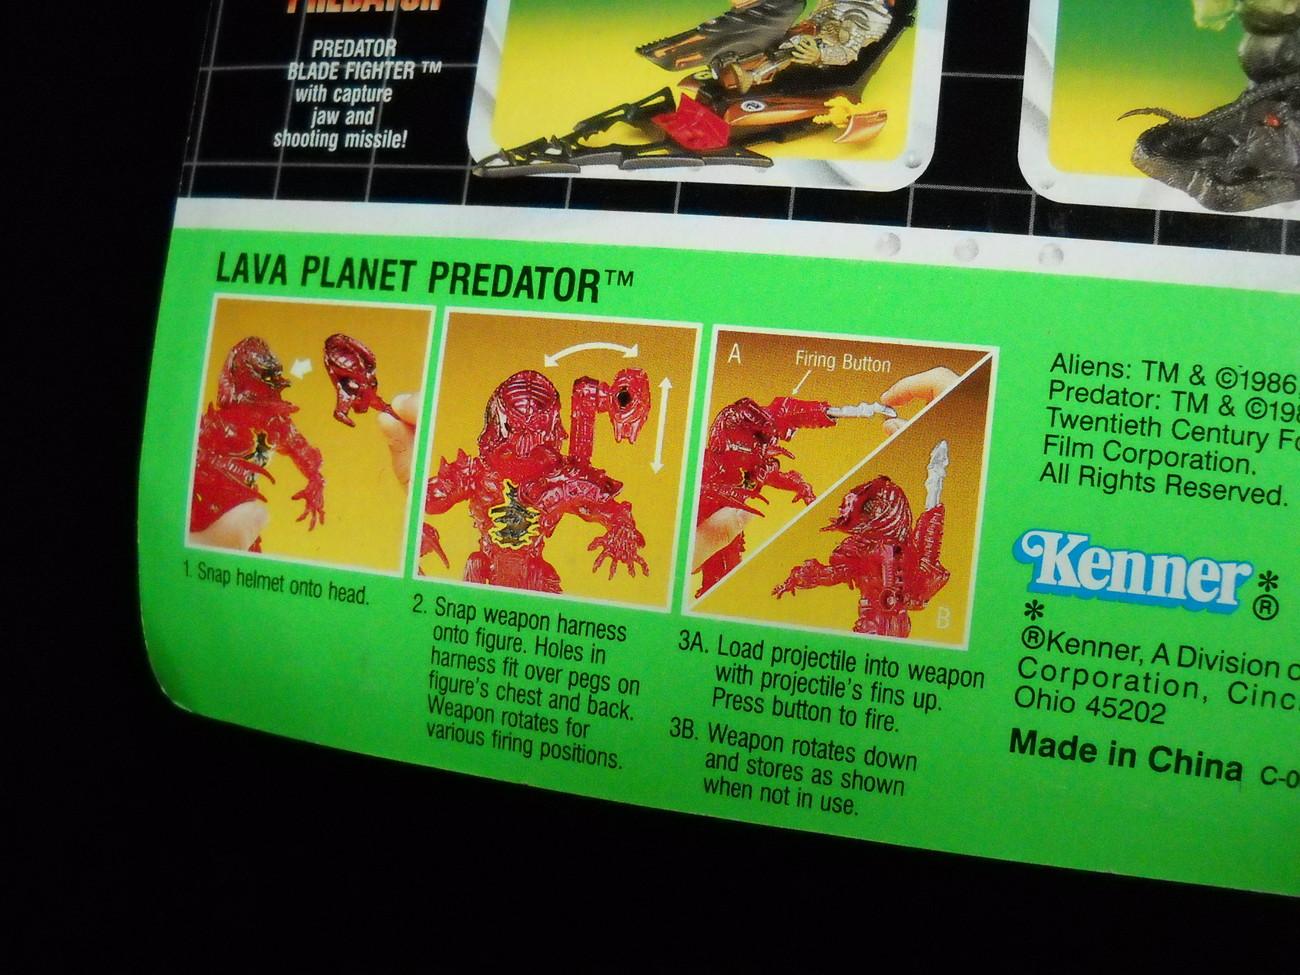 Kenner Predator 1994 Lava Planet Predator Sealed Still Factory Sealed on Card